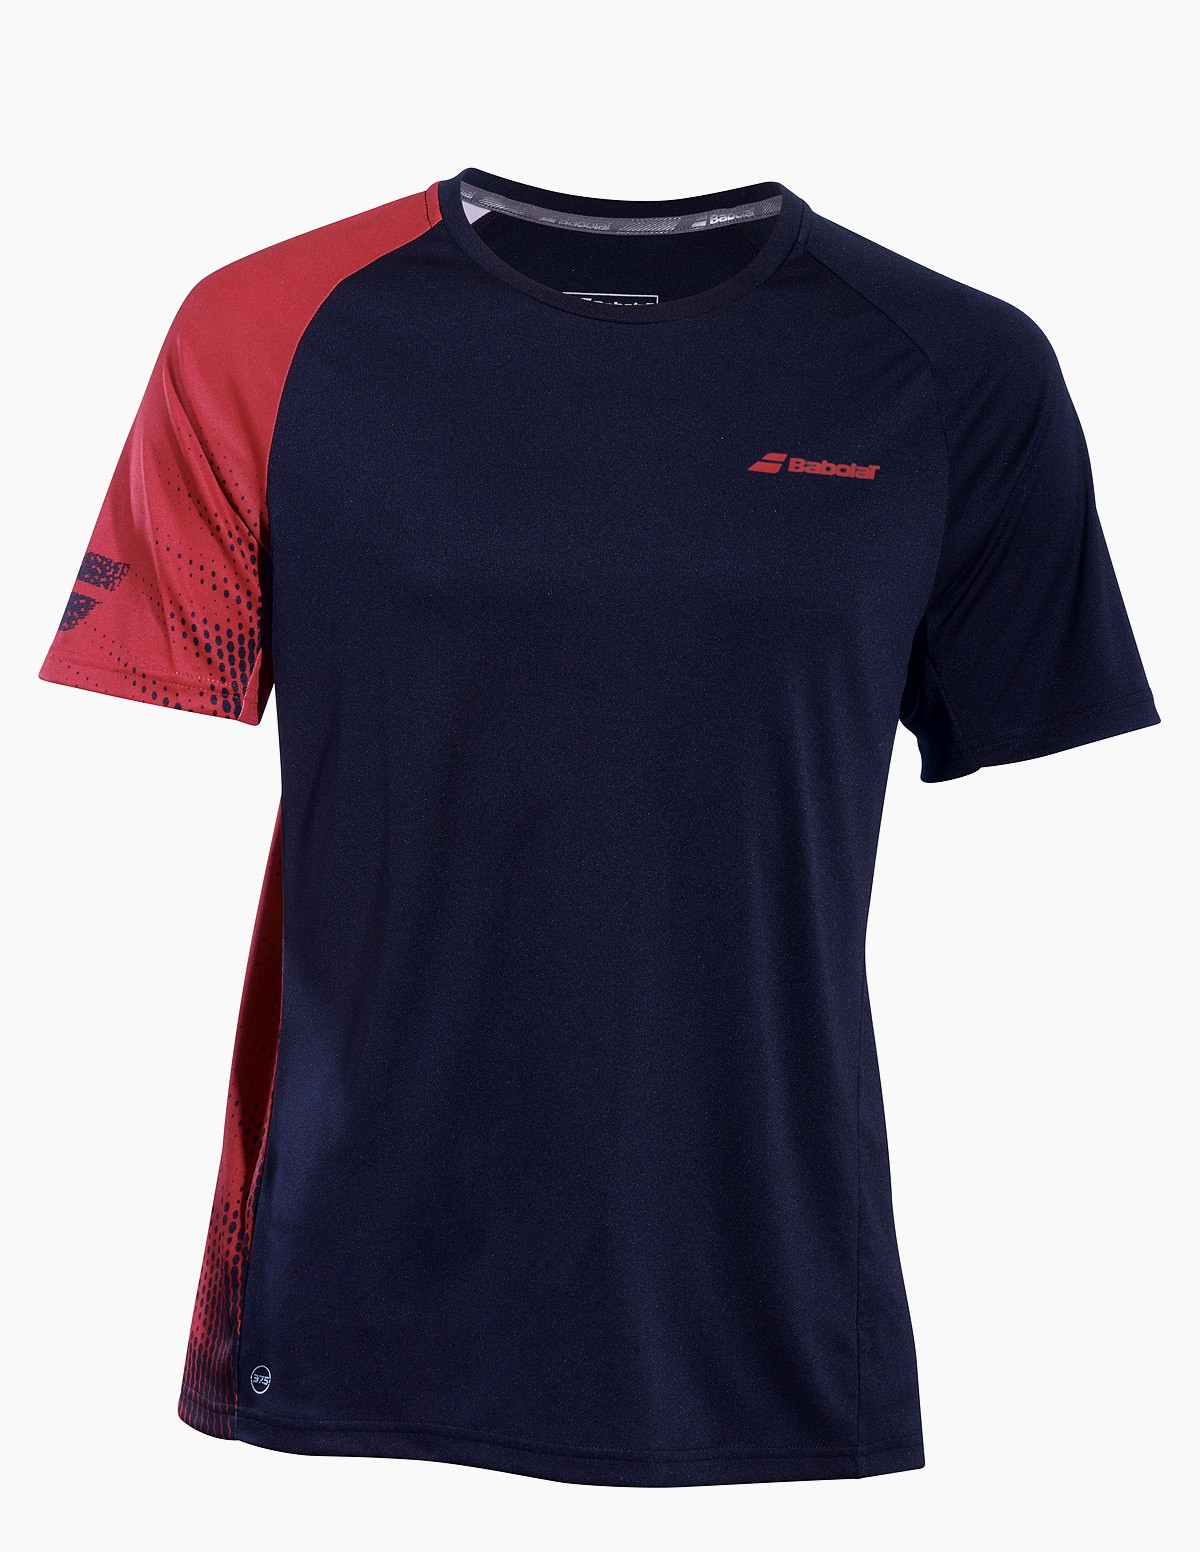 Koszulka tenisowa Babolat PERF T-shirt Black -45%